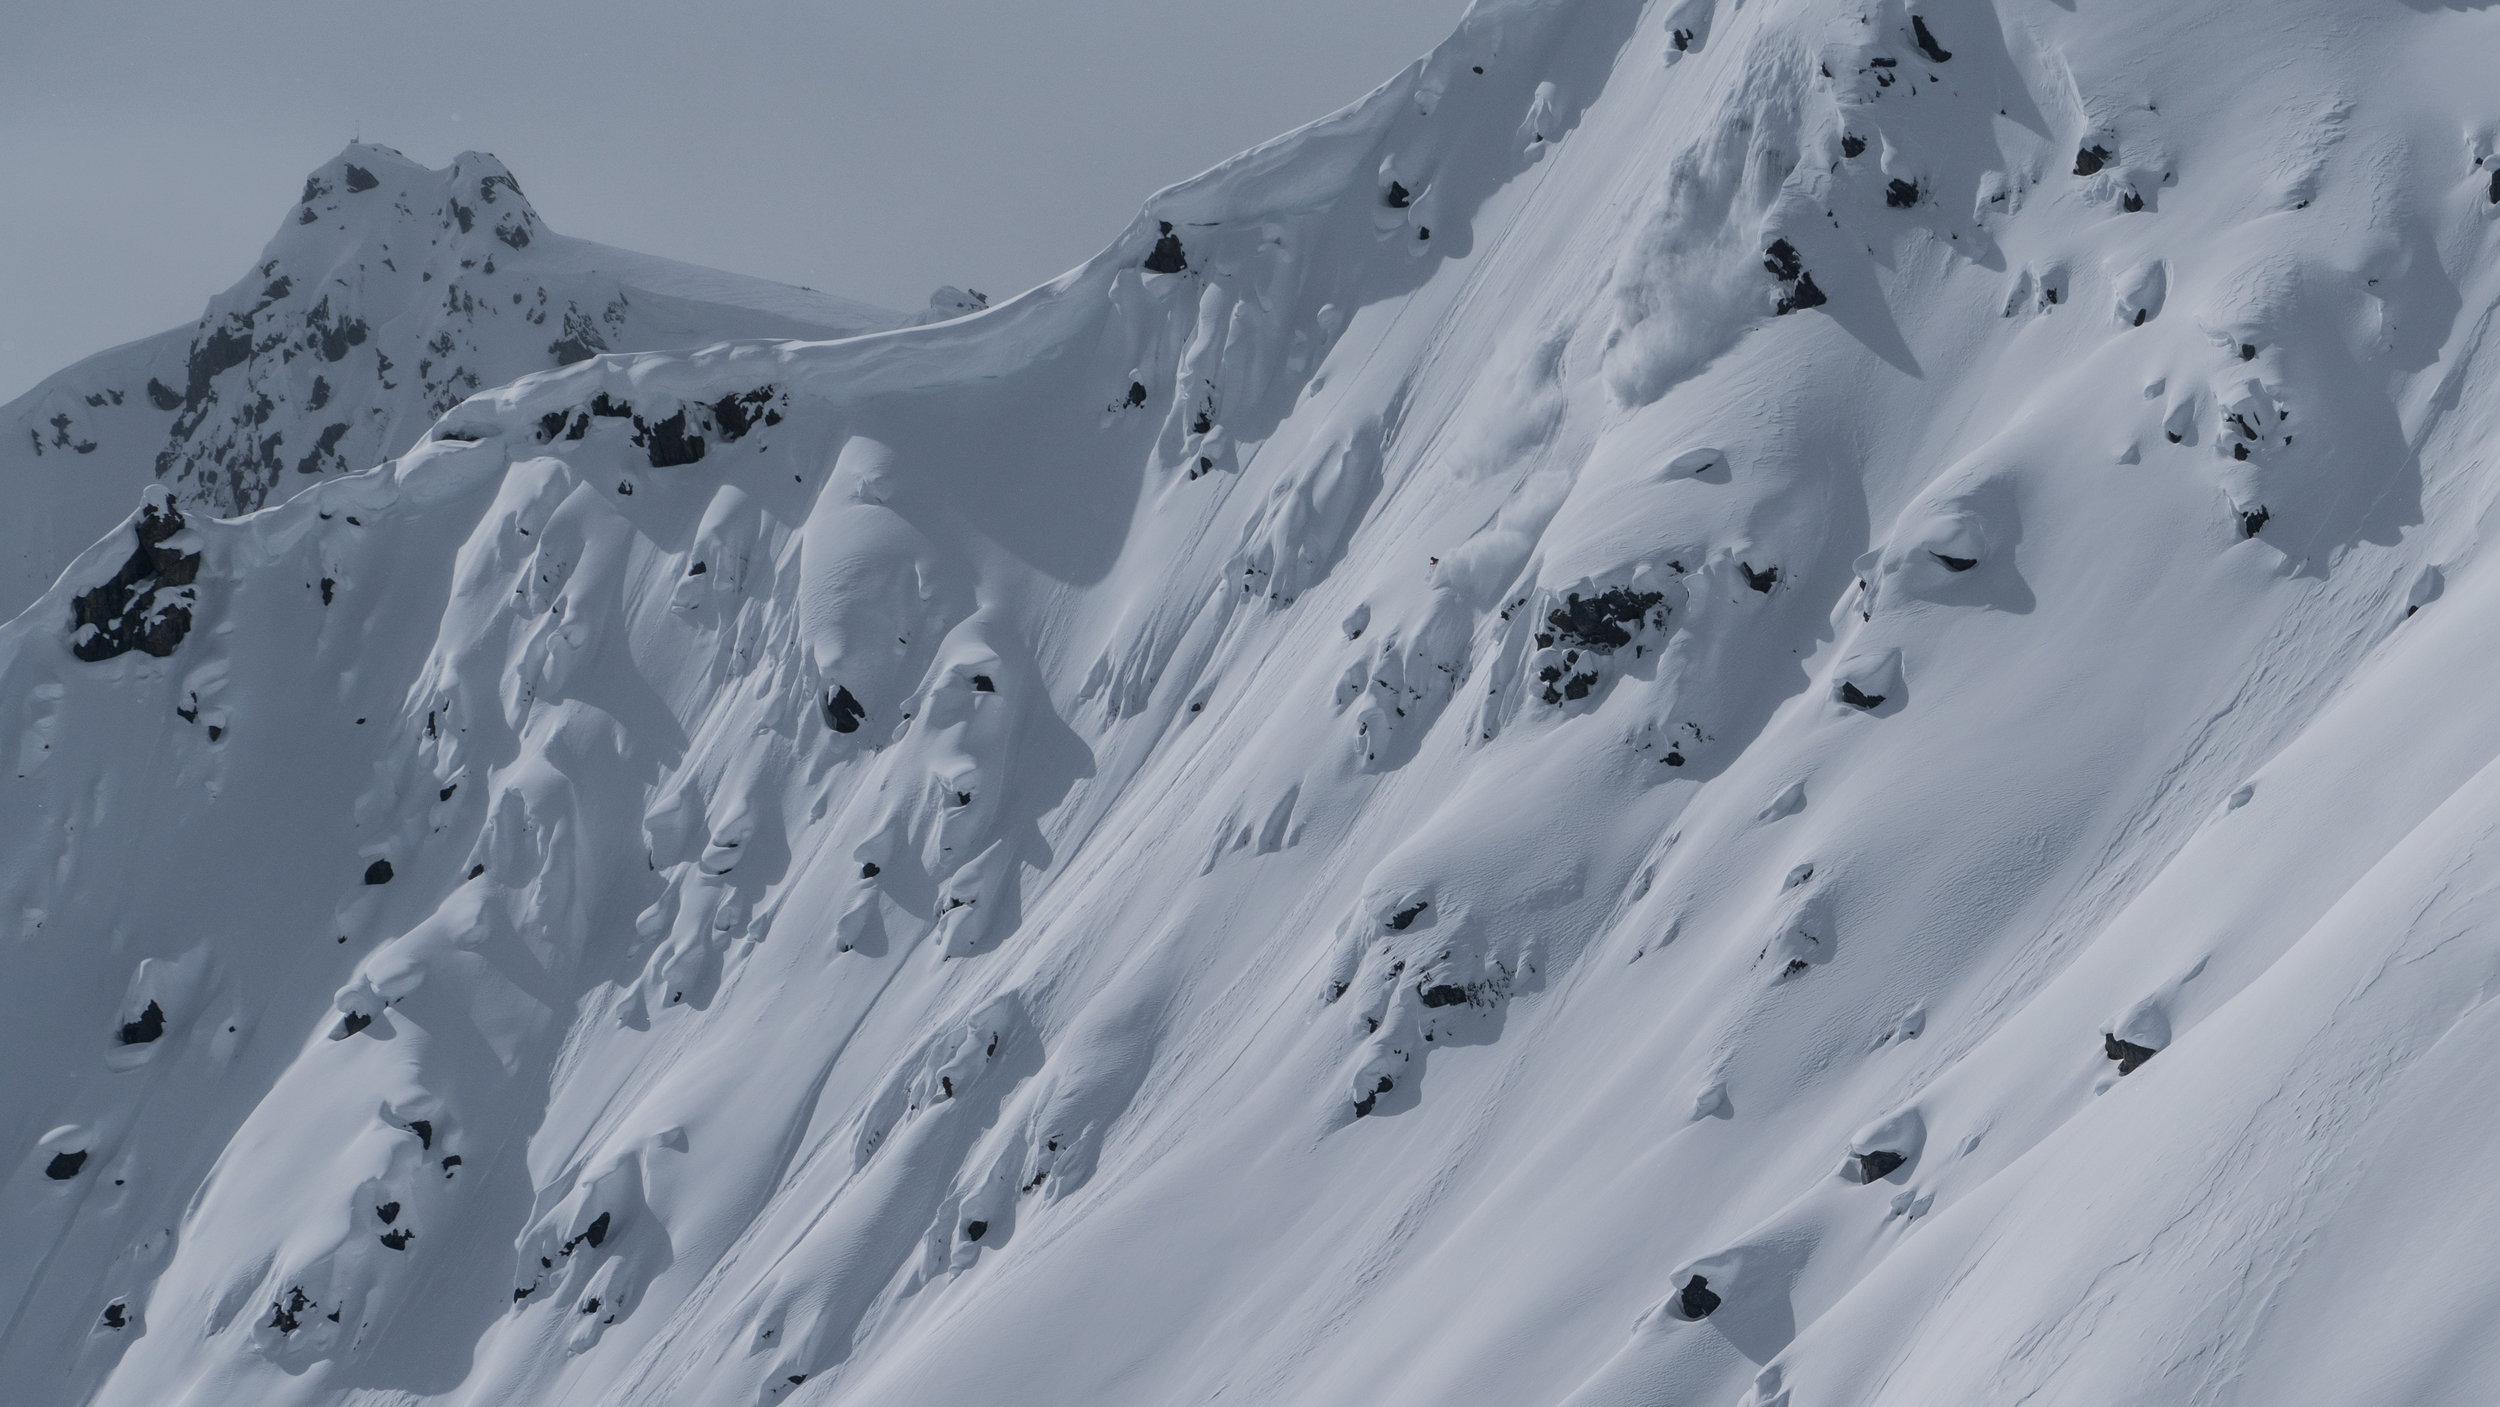 Hjertaas skiing. Shane Treat photo.